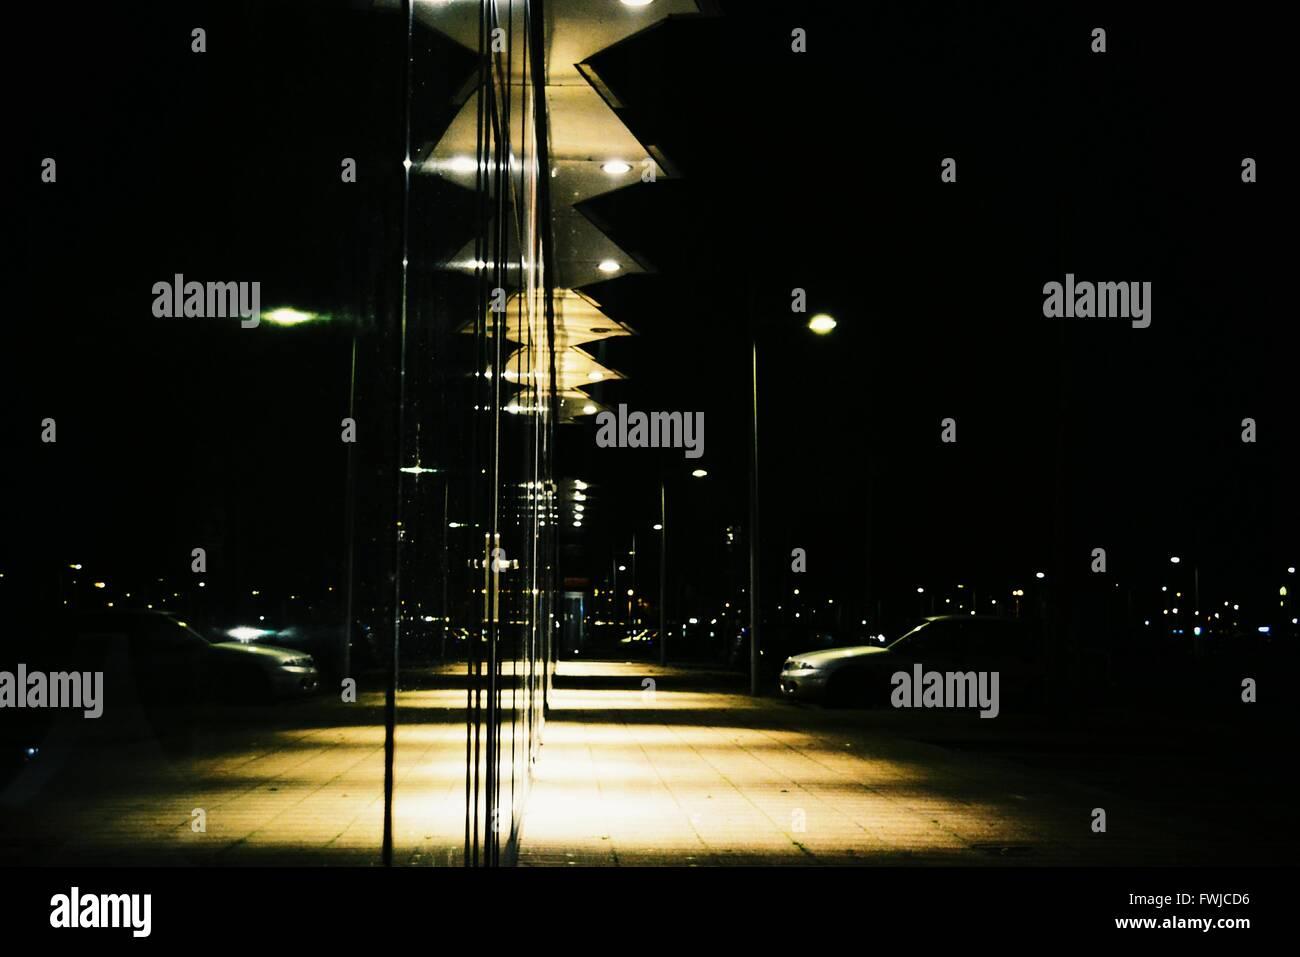 Illuminated Lighting Equipment On Glass Buildings At Night - Stock Image